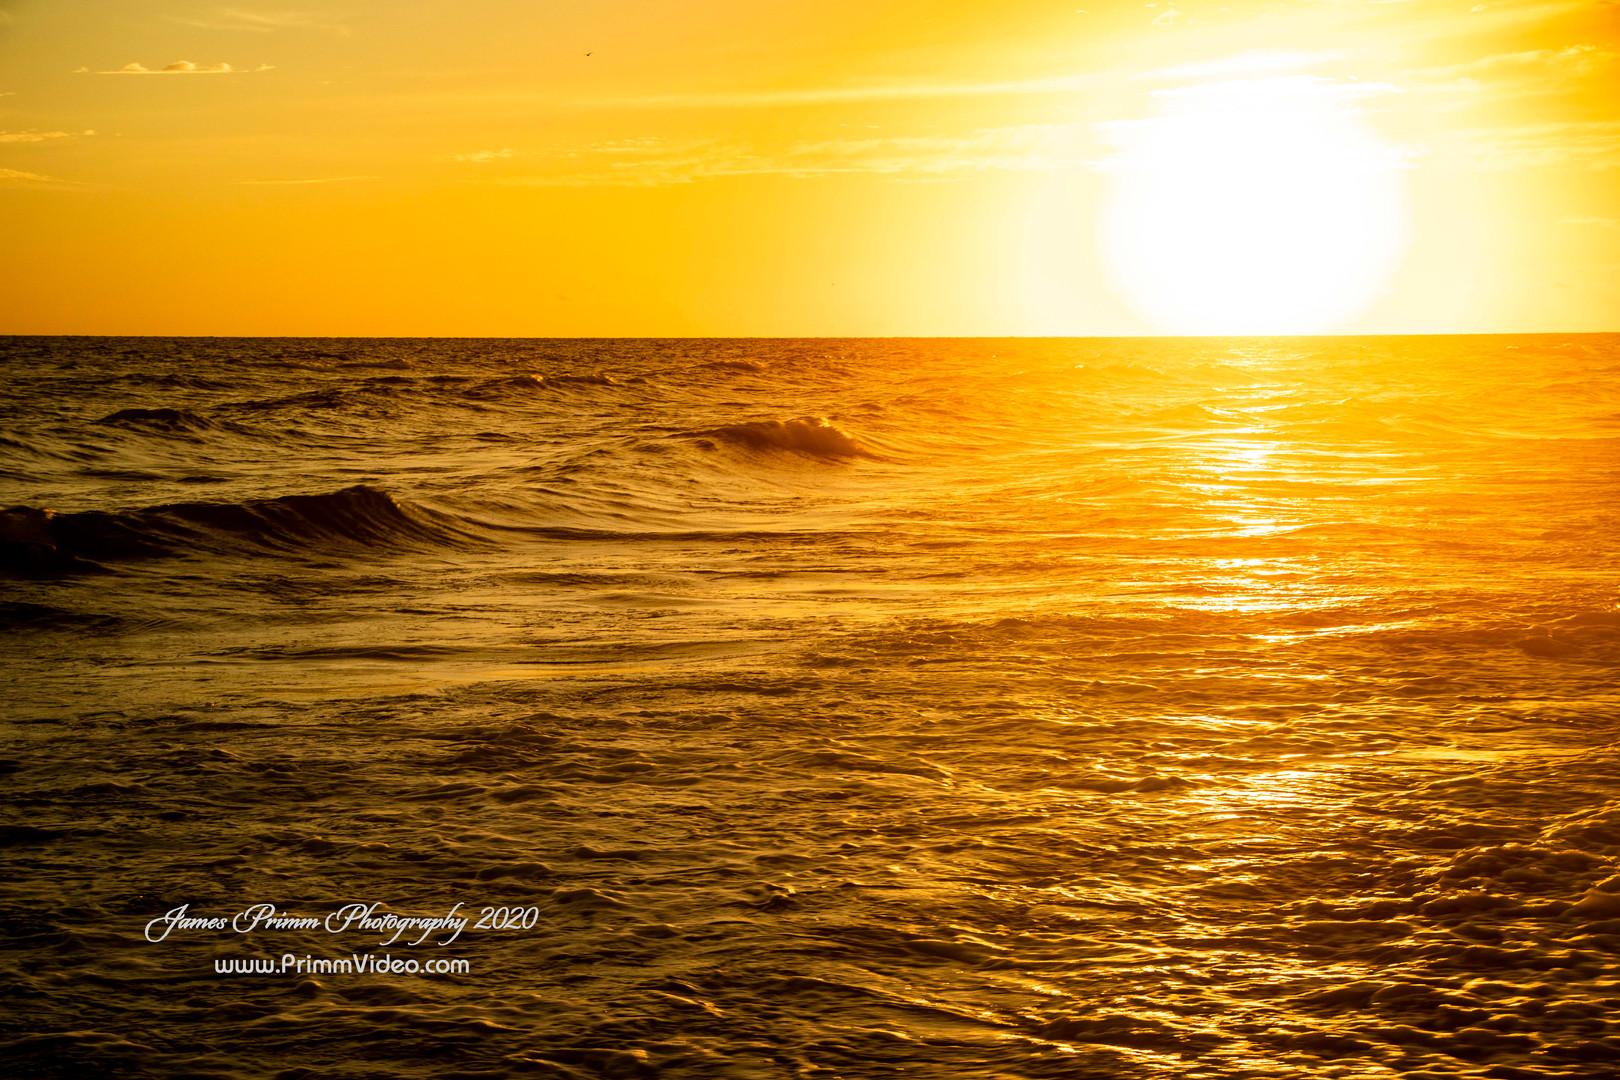 Sunset at sea.jpg